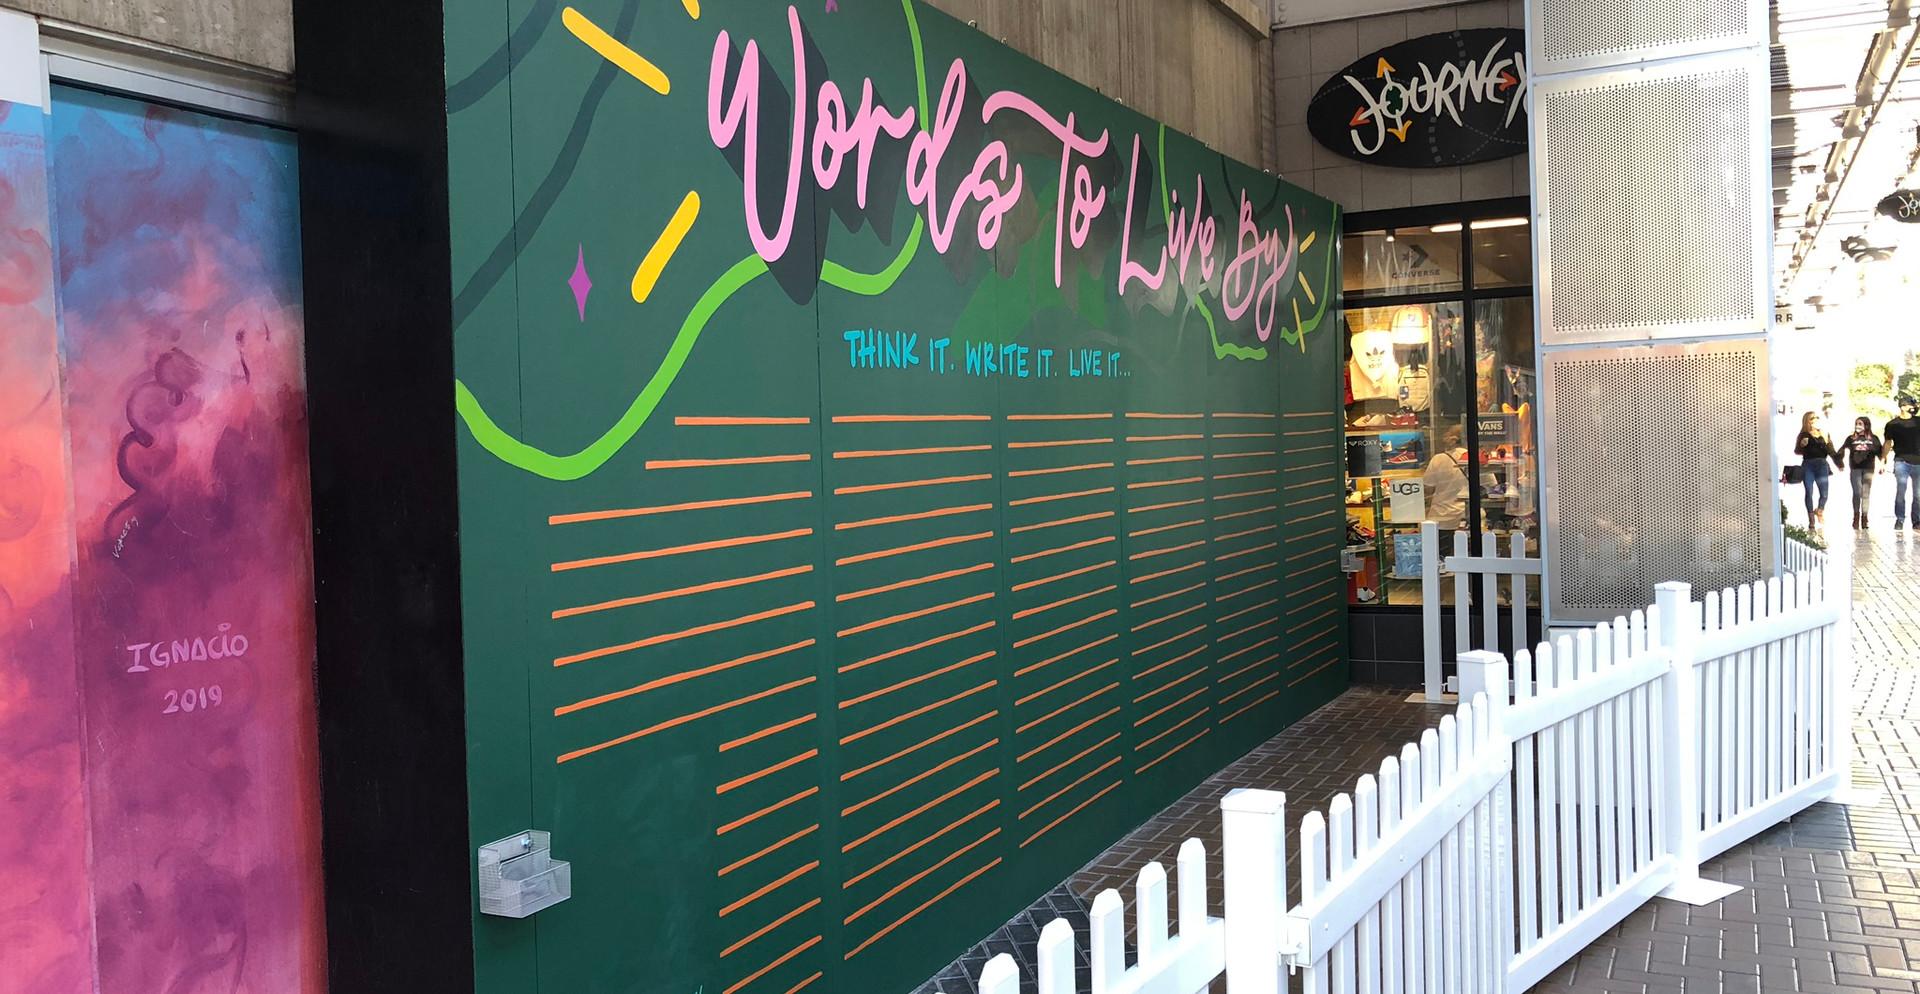 Tempe Marketplace Interactive Chalkboard Mural